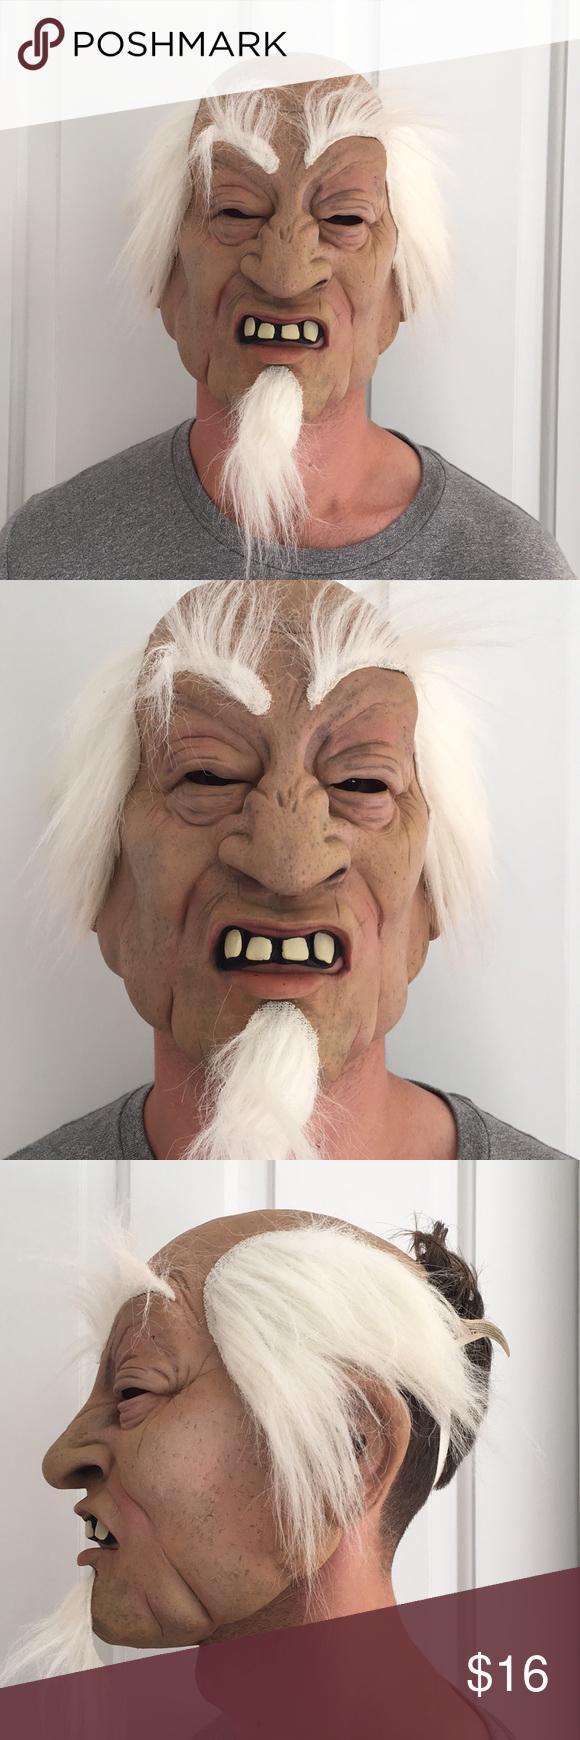 Halloween Mask Scary Old Man Scary Halloween Masks Halloween Masks Old Man Mask